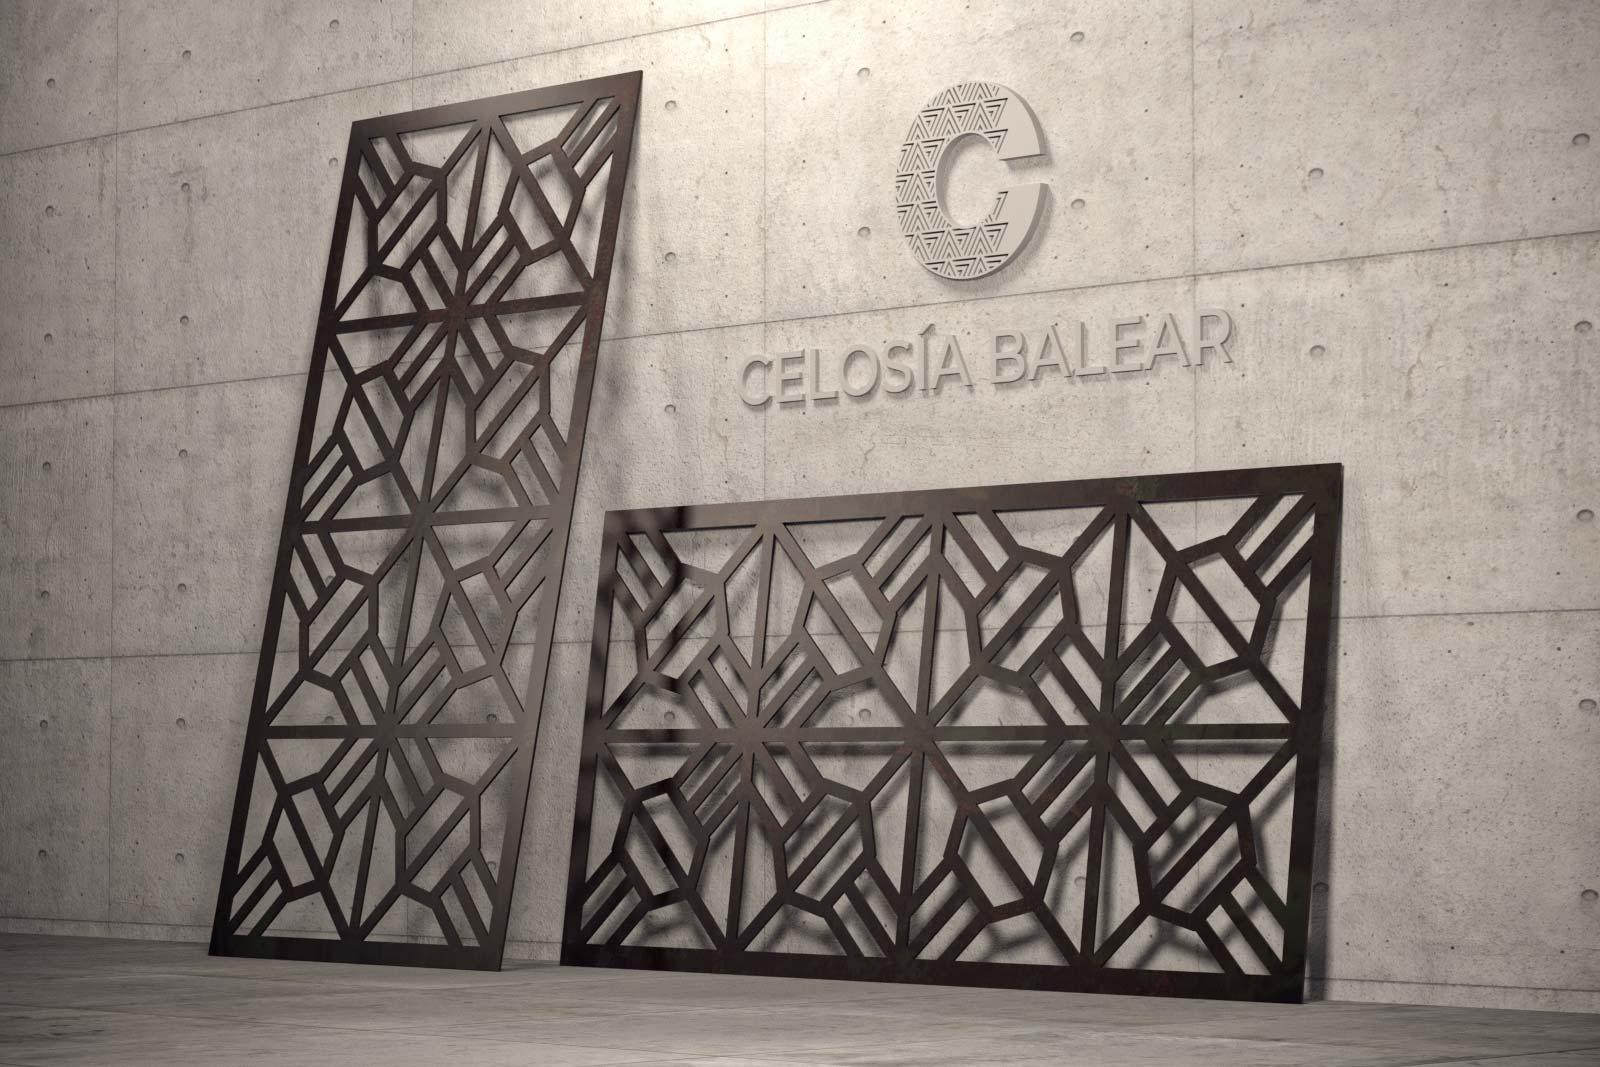 Diseño cubista para arquitectura interior y exterior